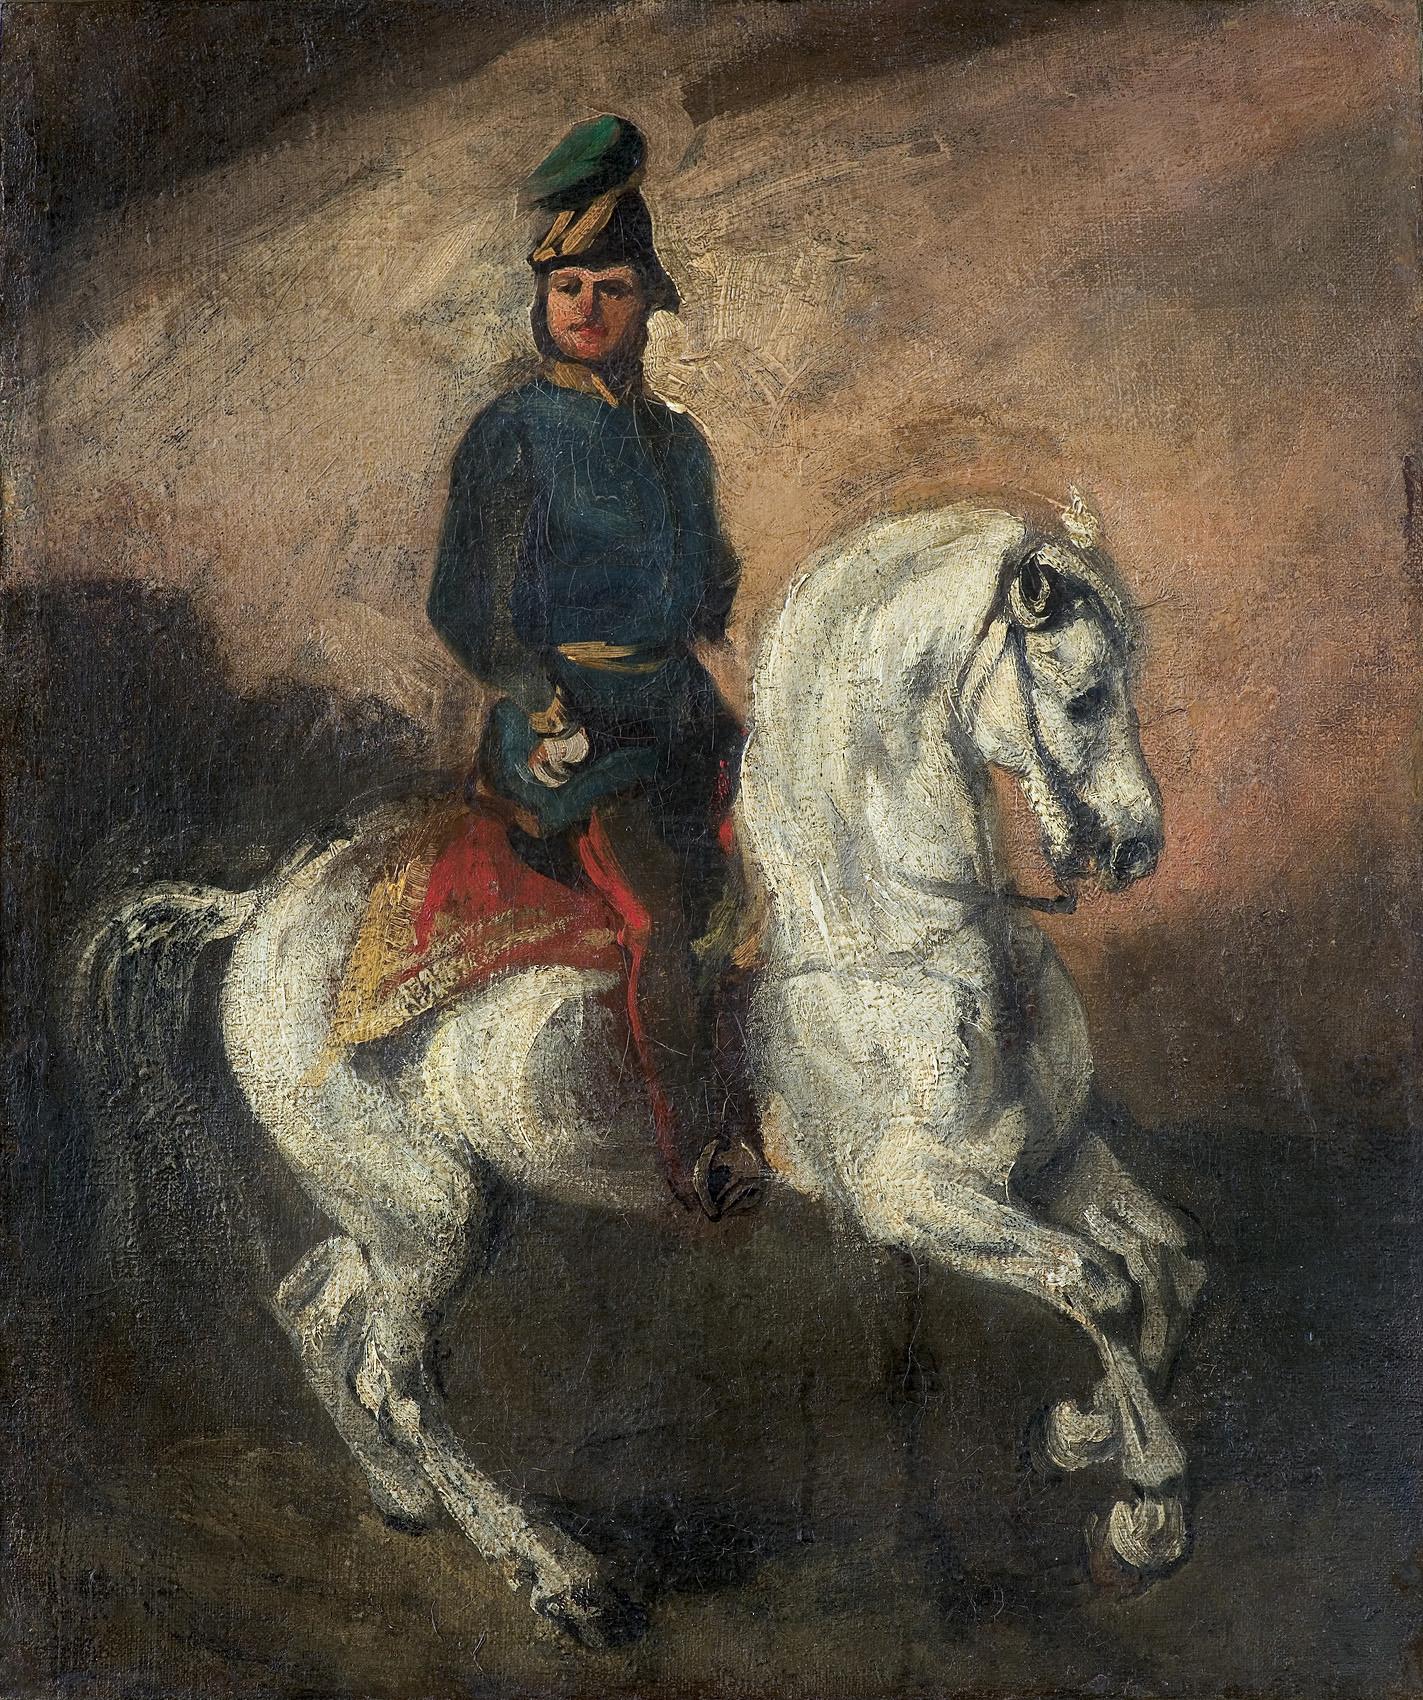 GENERAŁ LEGEDITSCH NA KONIU, 1848-1850